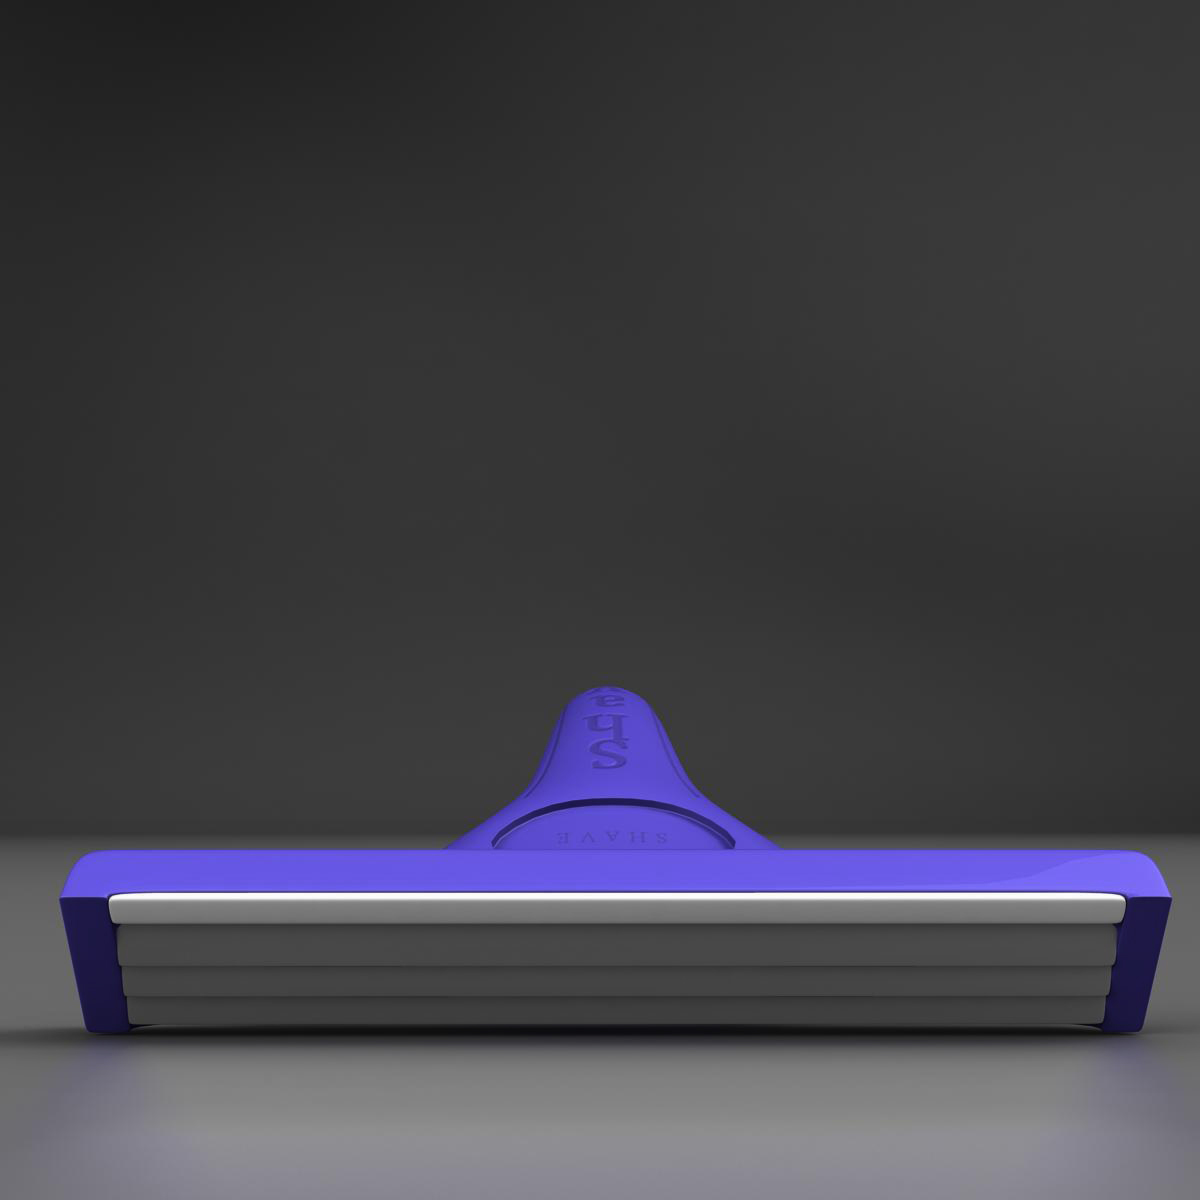 safety razor 3d model 3ds max fbx ma mb obj 158375